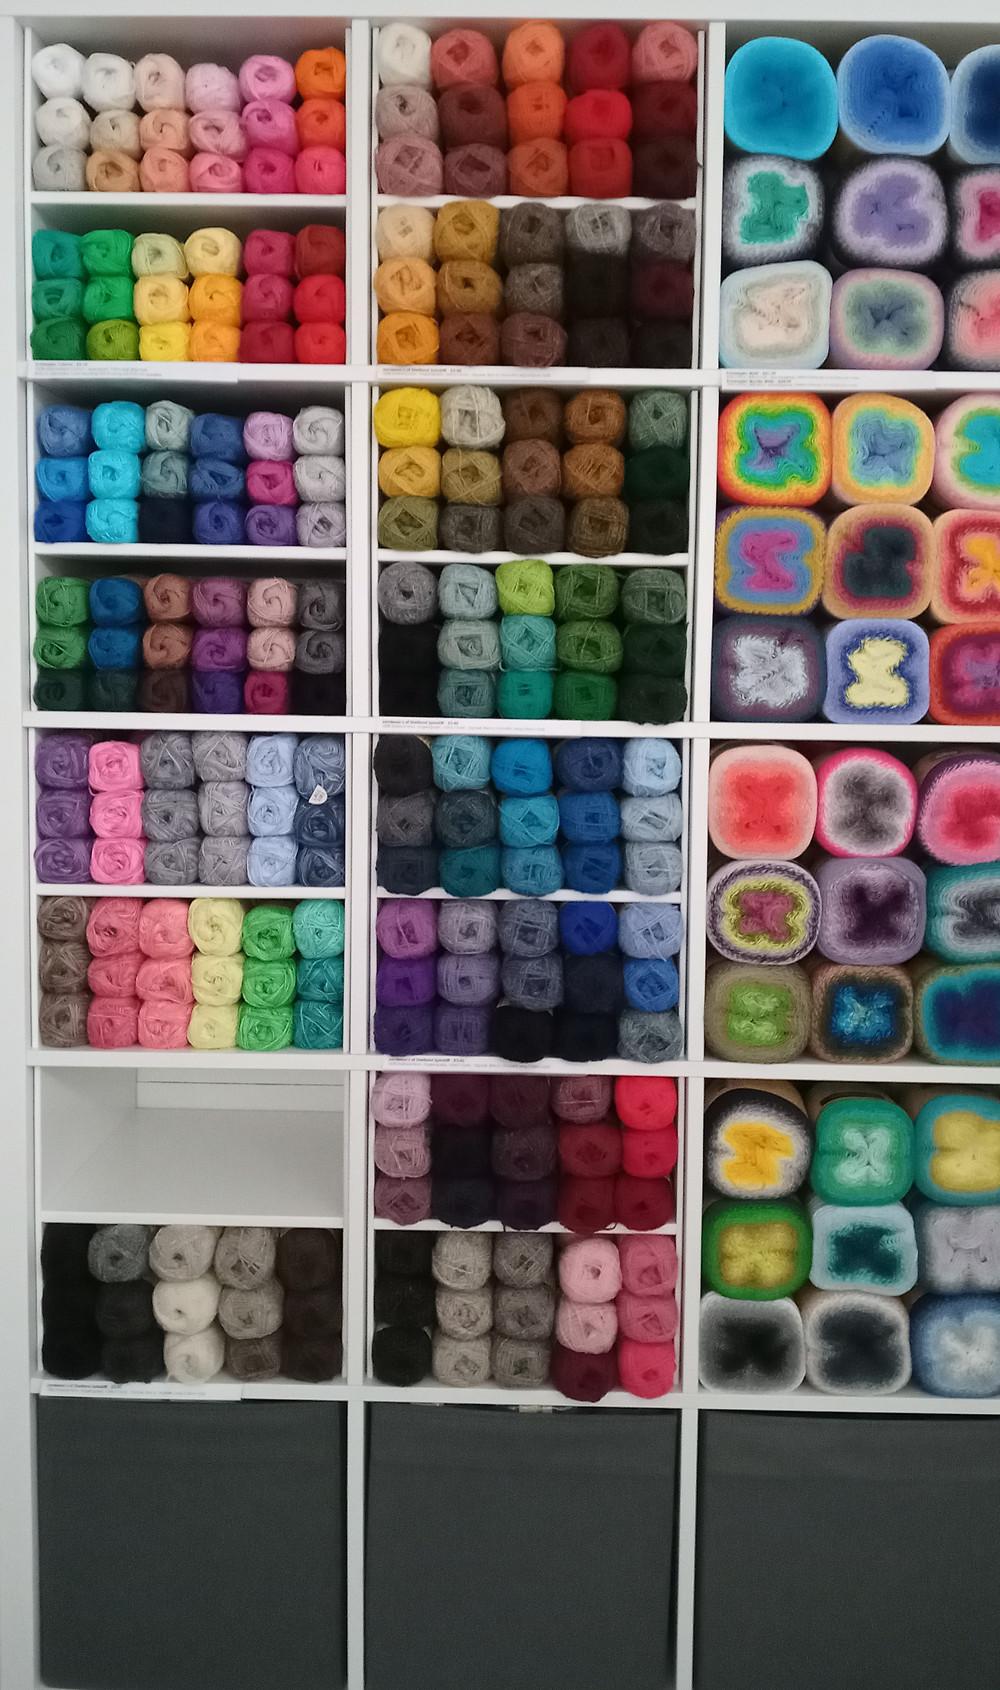 Shelves of yarn - Jamieson's of Shetland Spindrift - an array of colours at Baa!